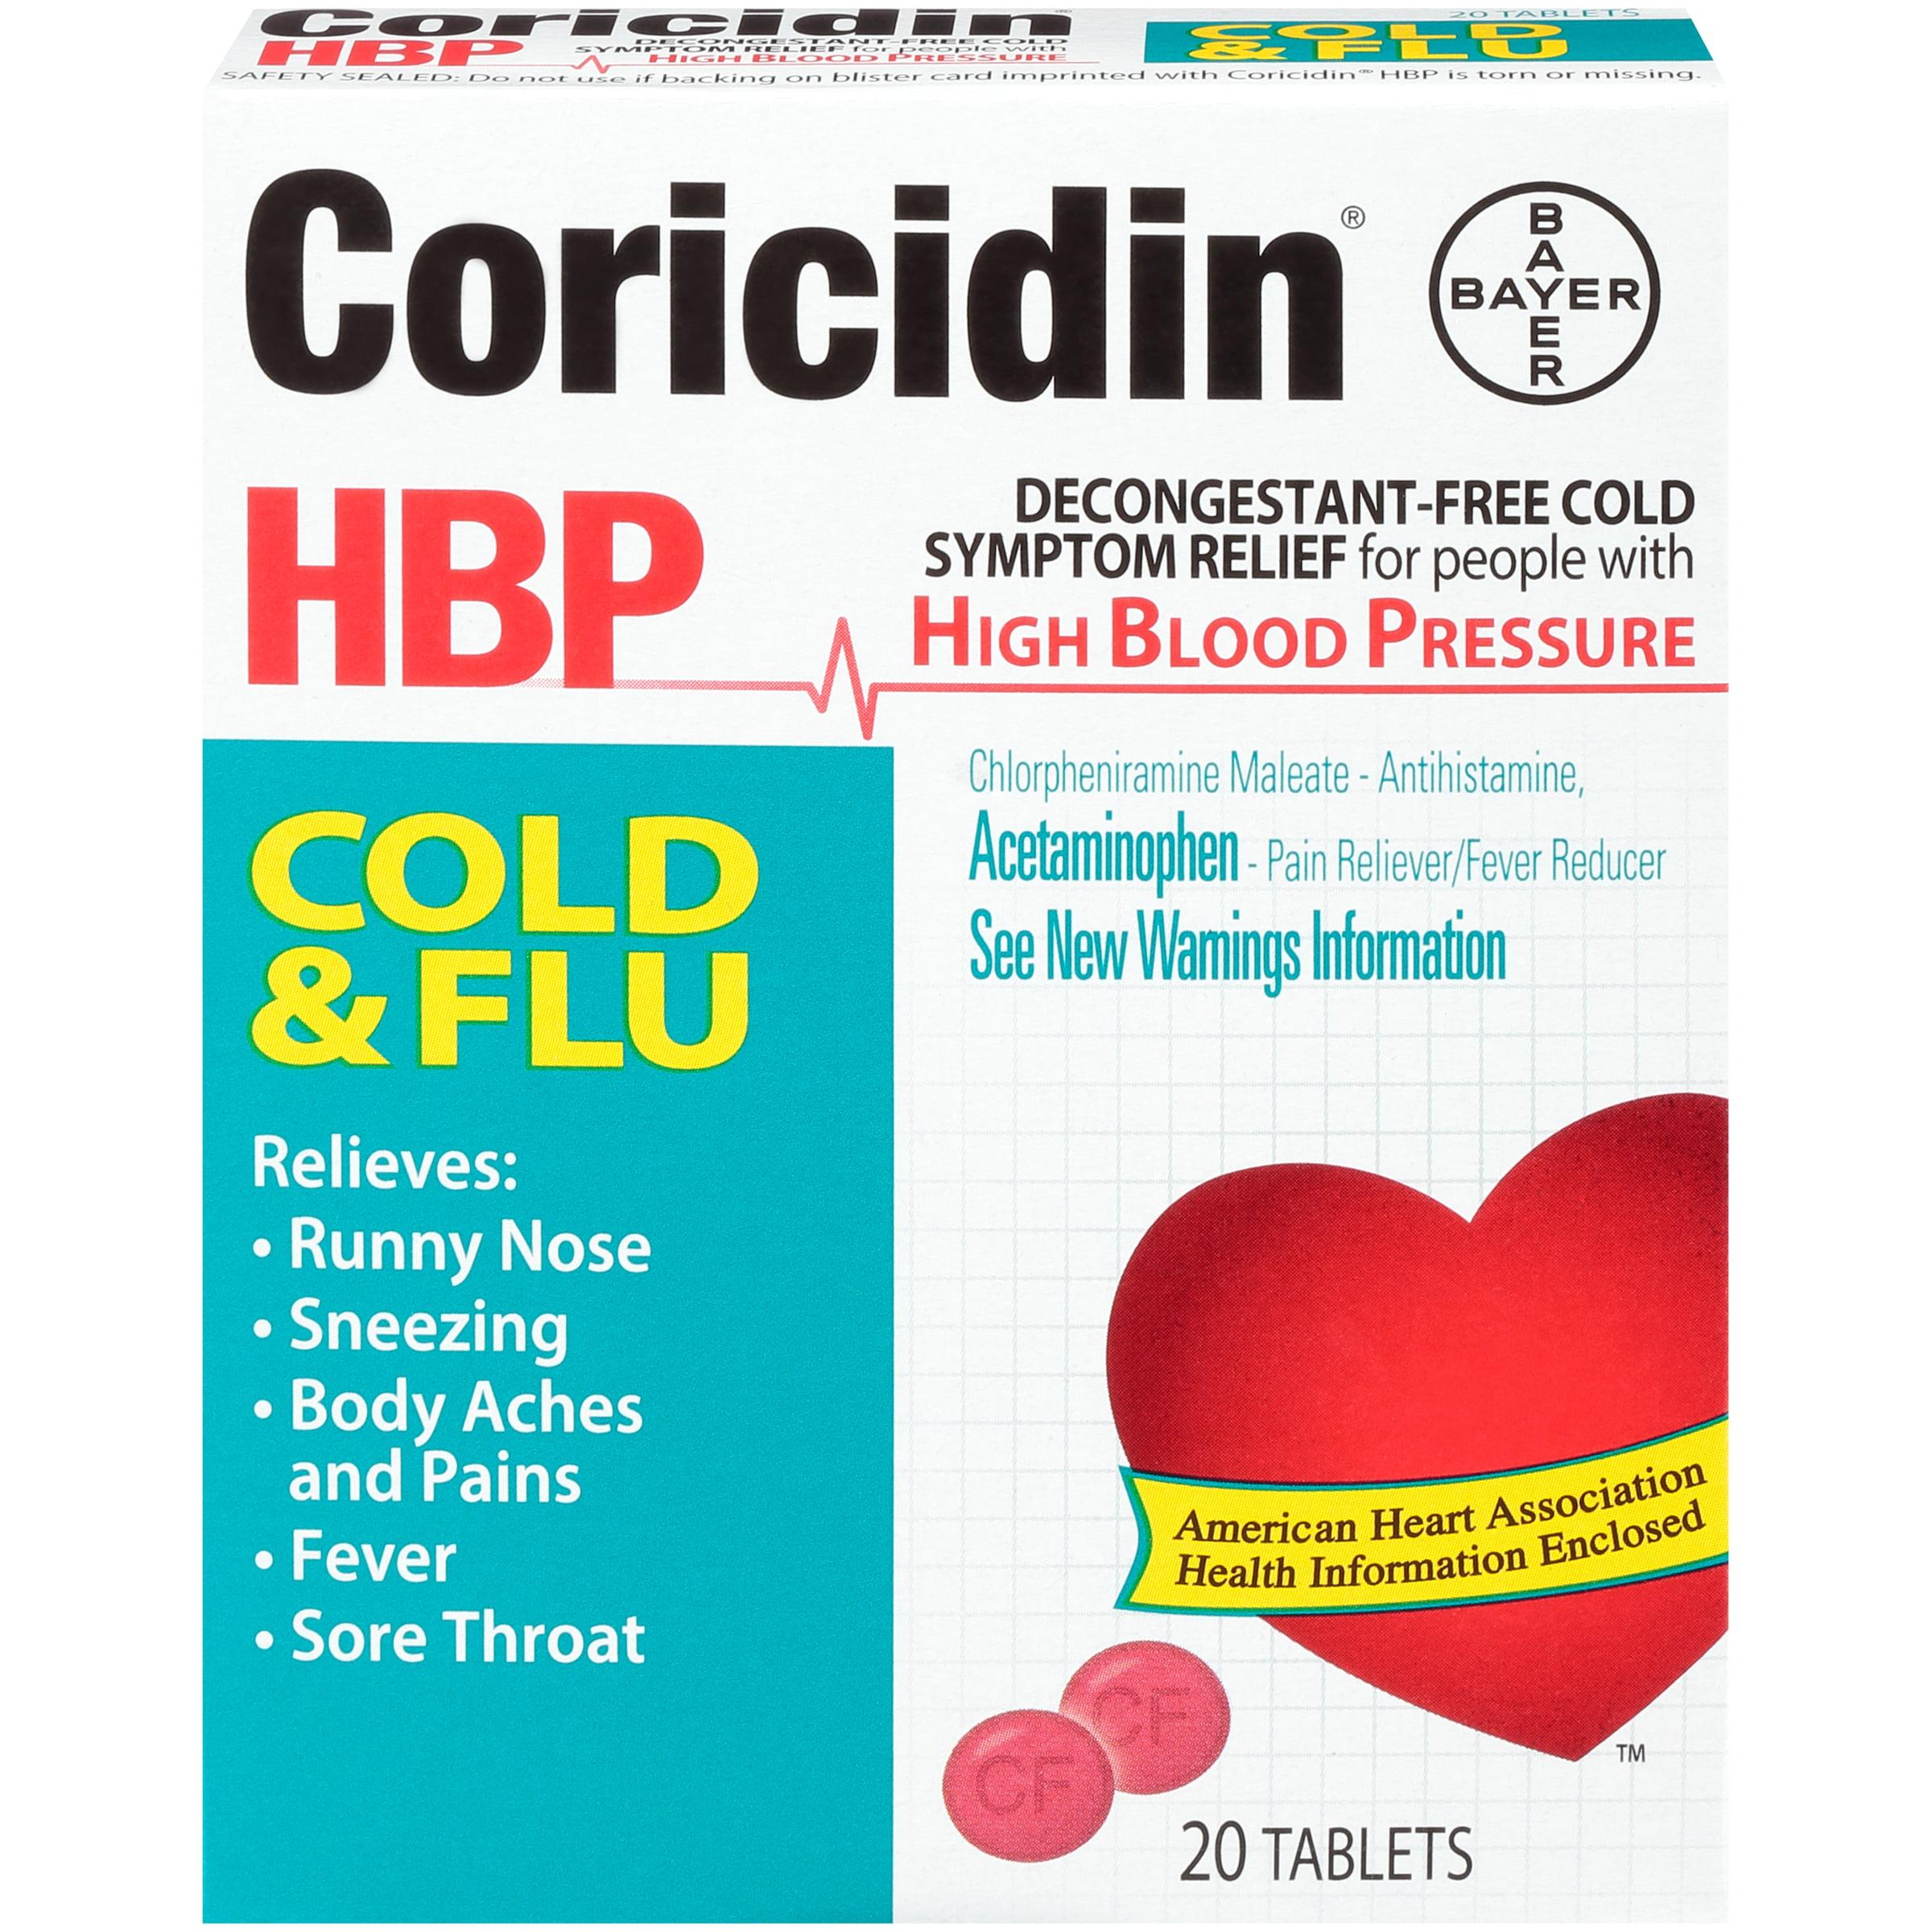 Coricidin HBP, Cold & Flu Tablets, 20 CT